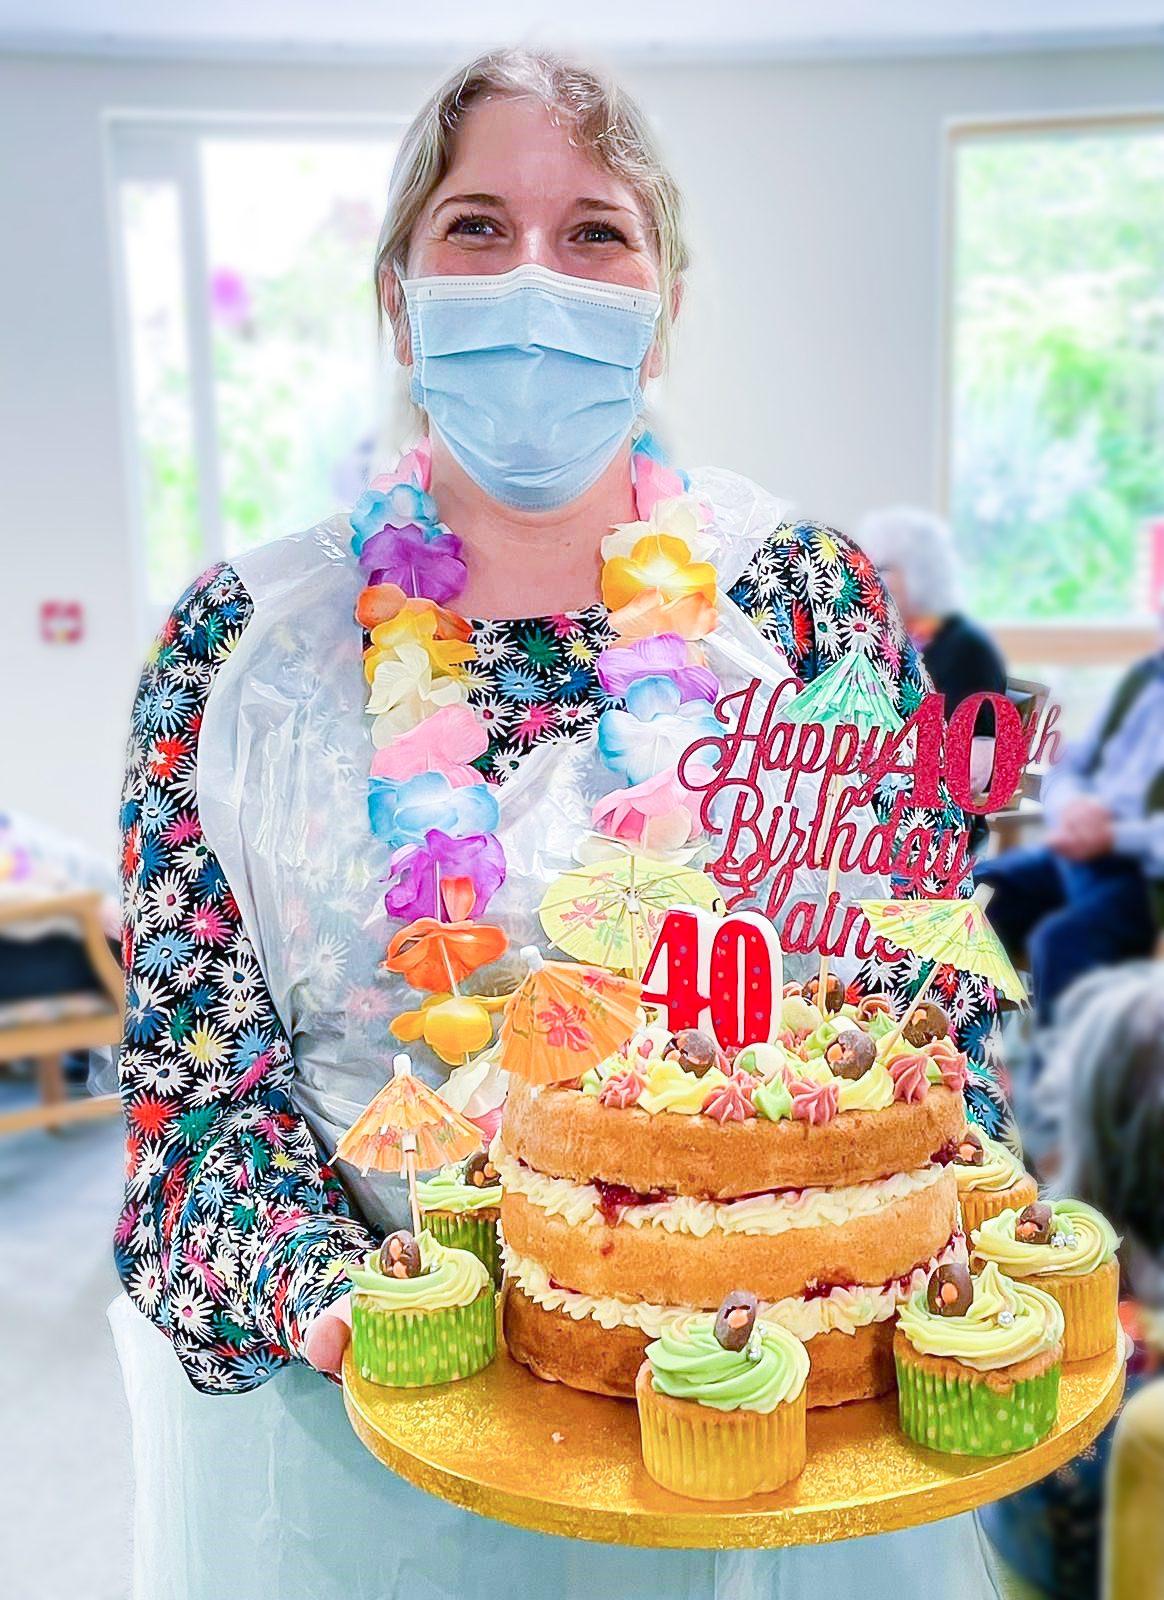 Elaine Banks with her birthday cake at Bradbury Court care home